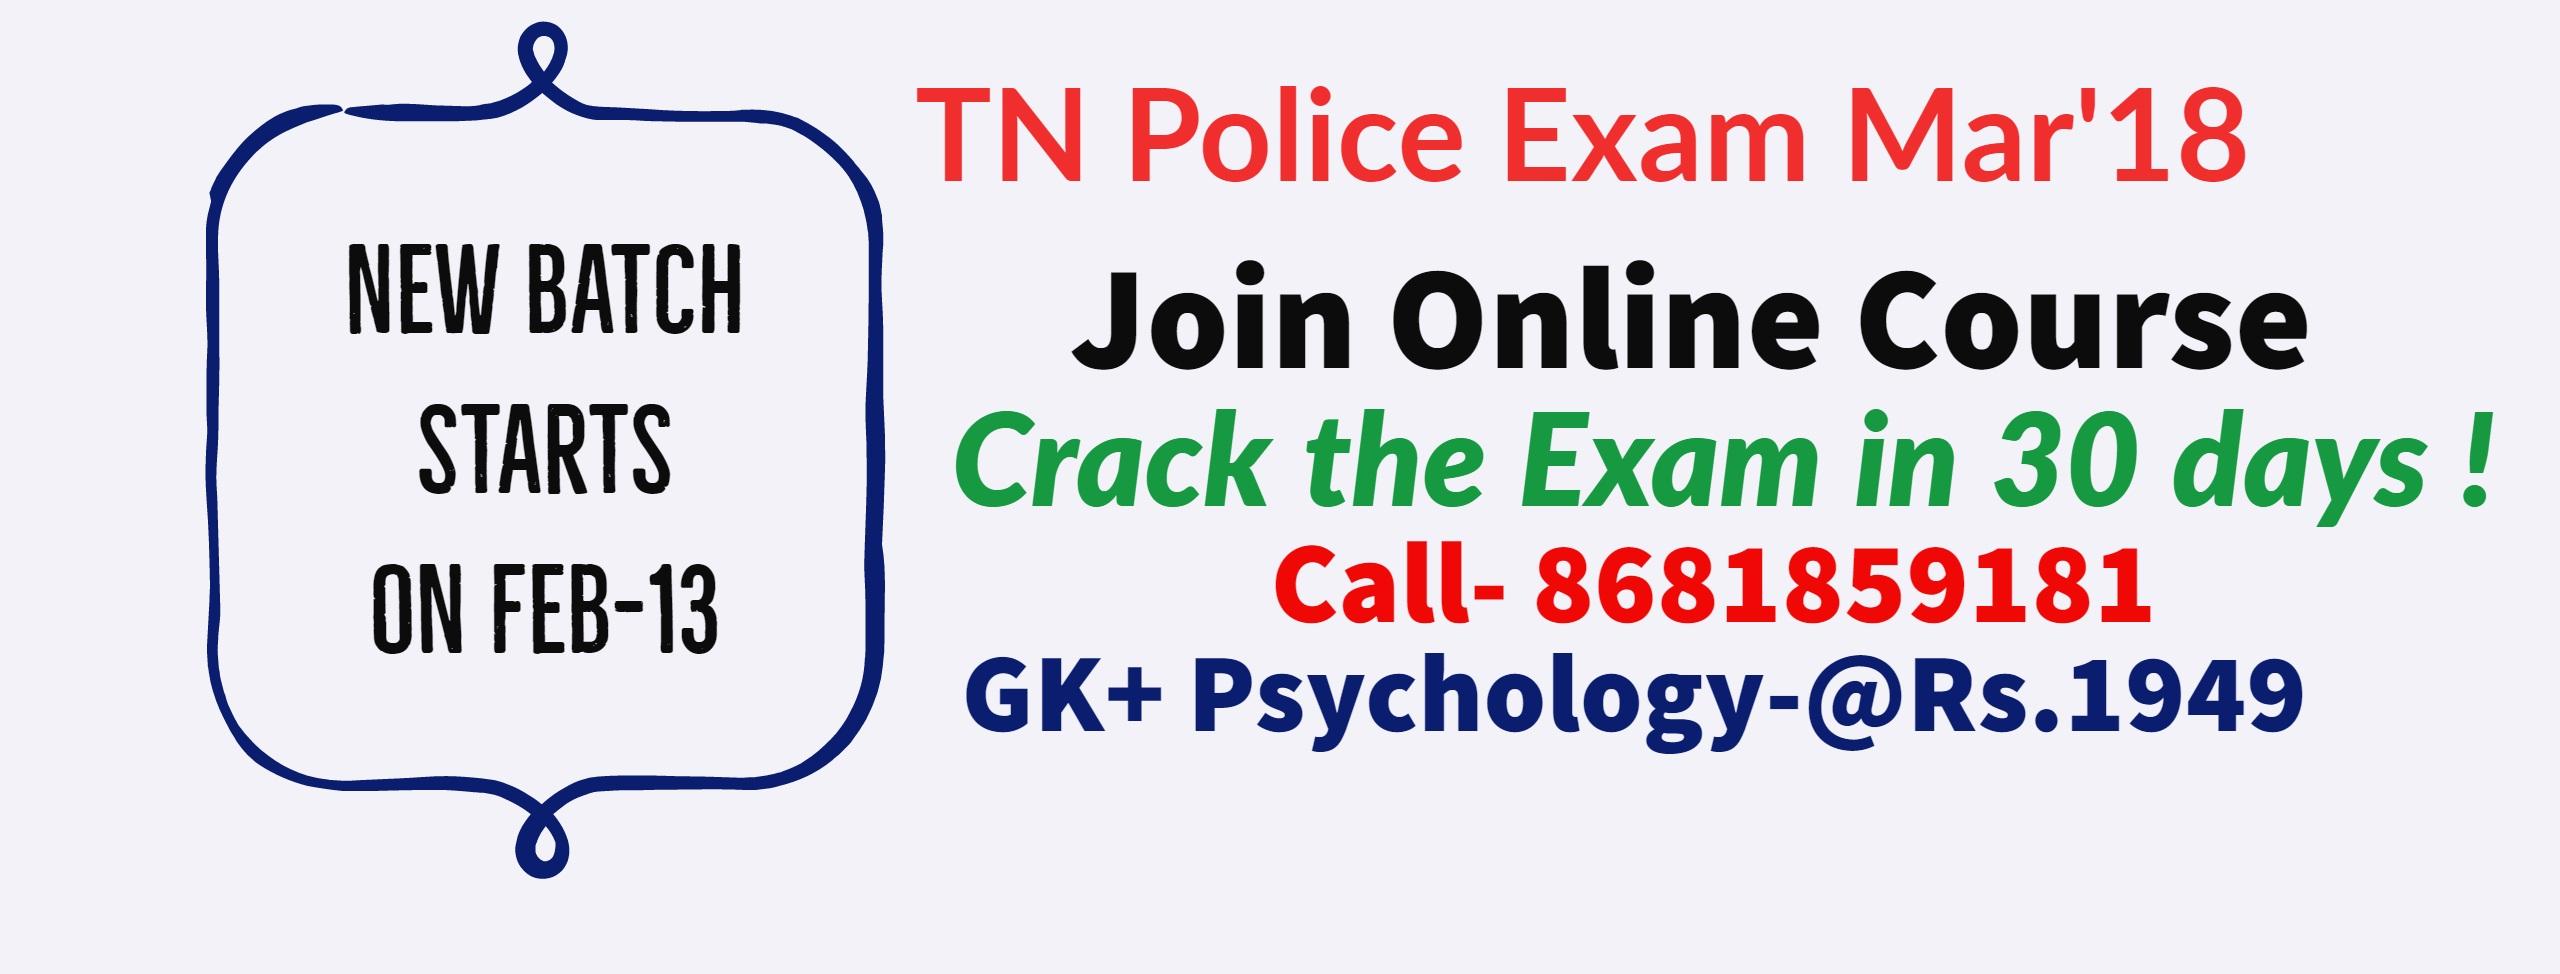 TN Police Exam 2018